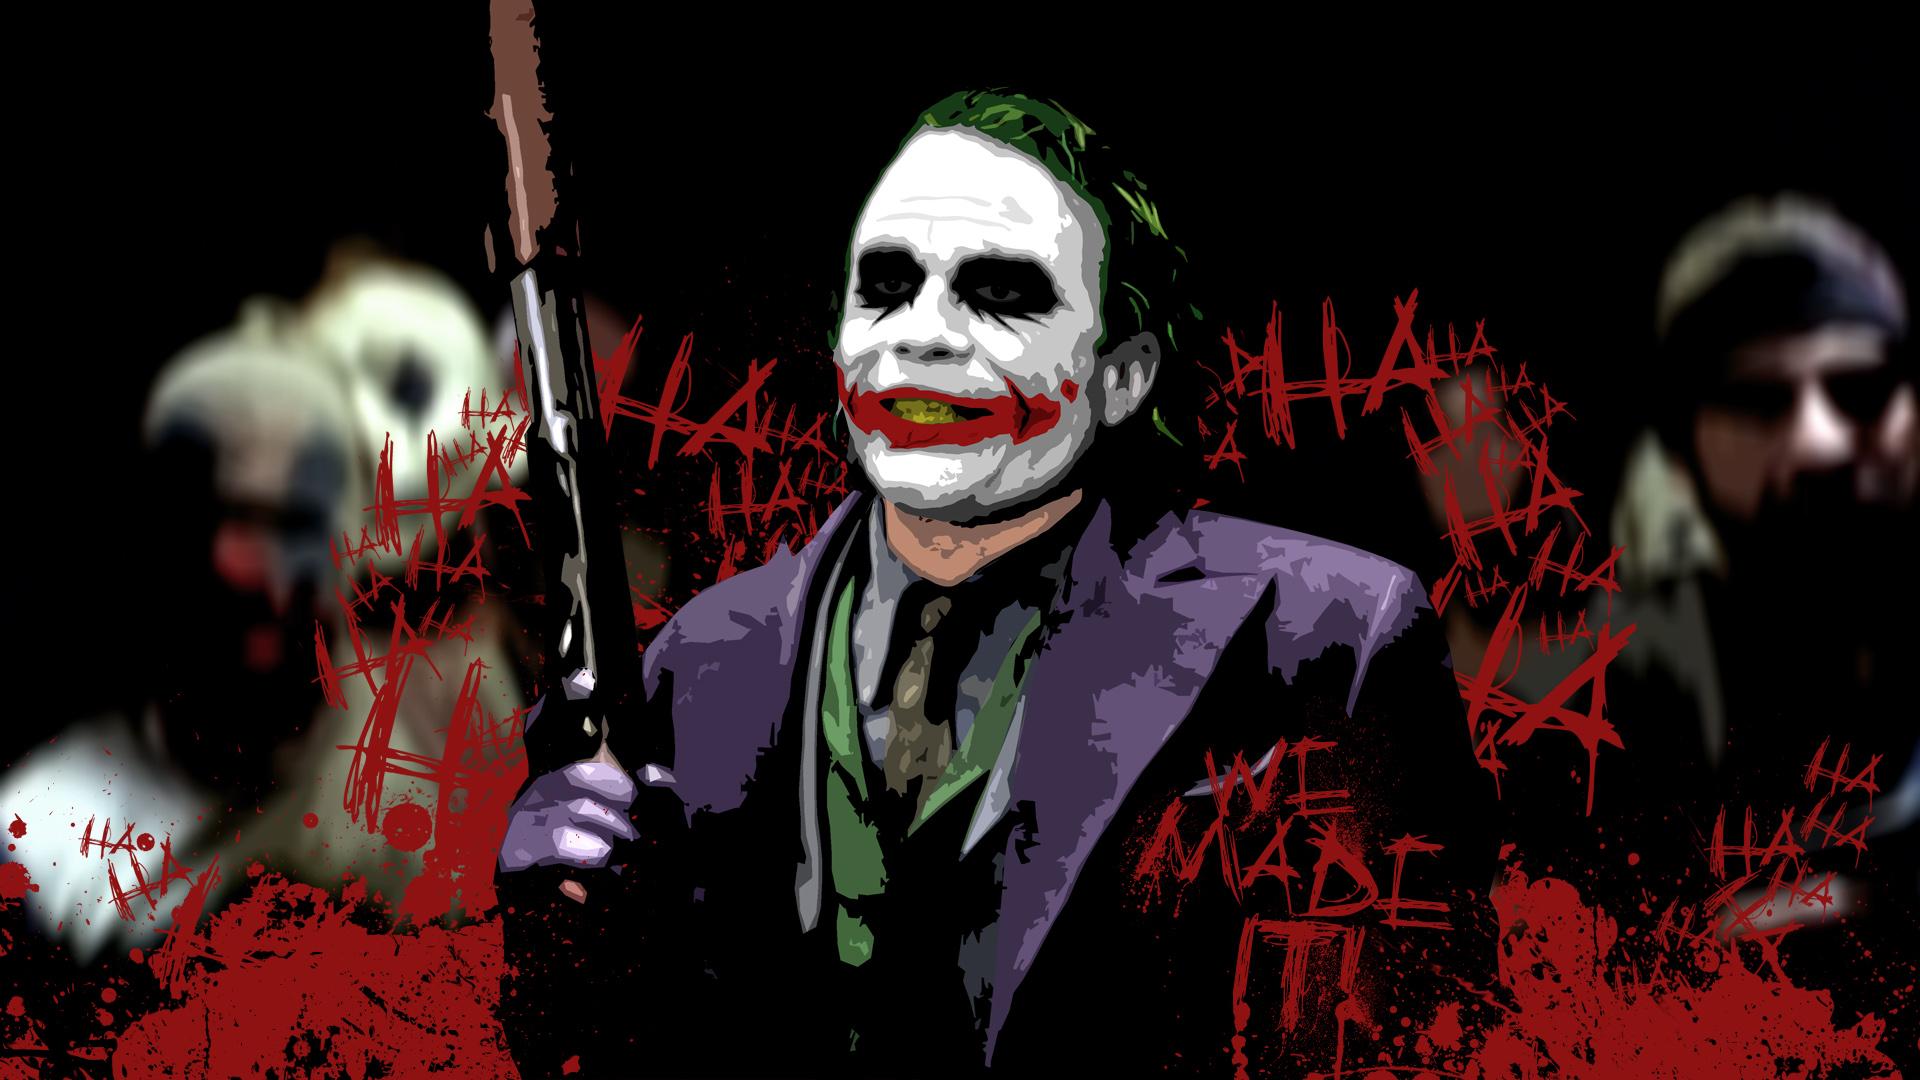 joker   The Joker Wallpaper 28092799 1920x1080